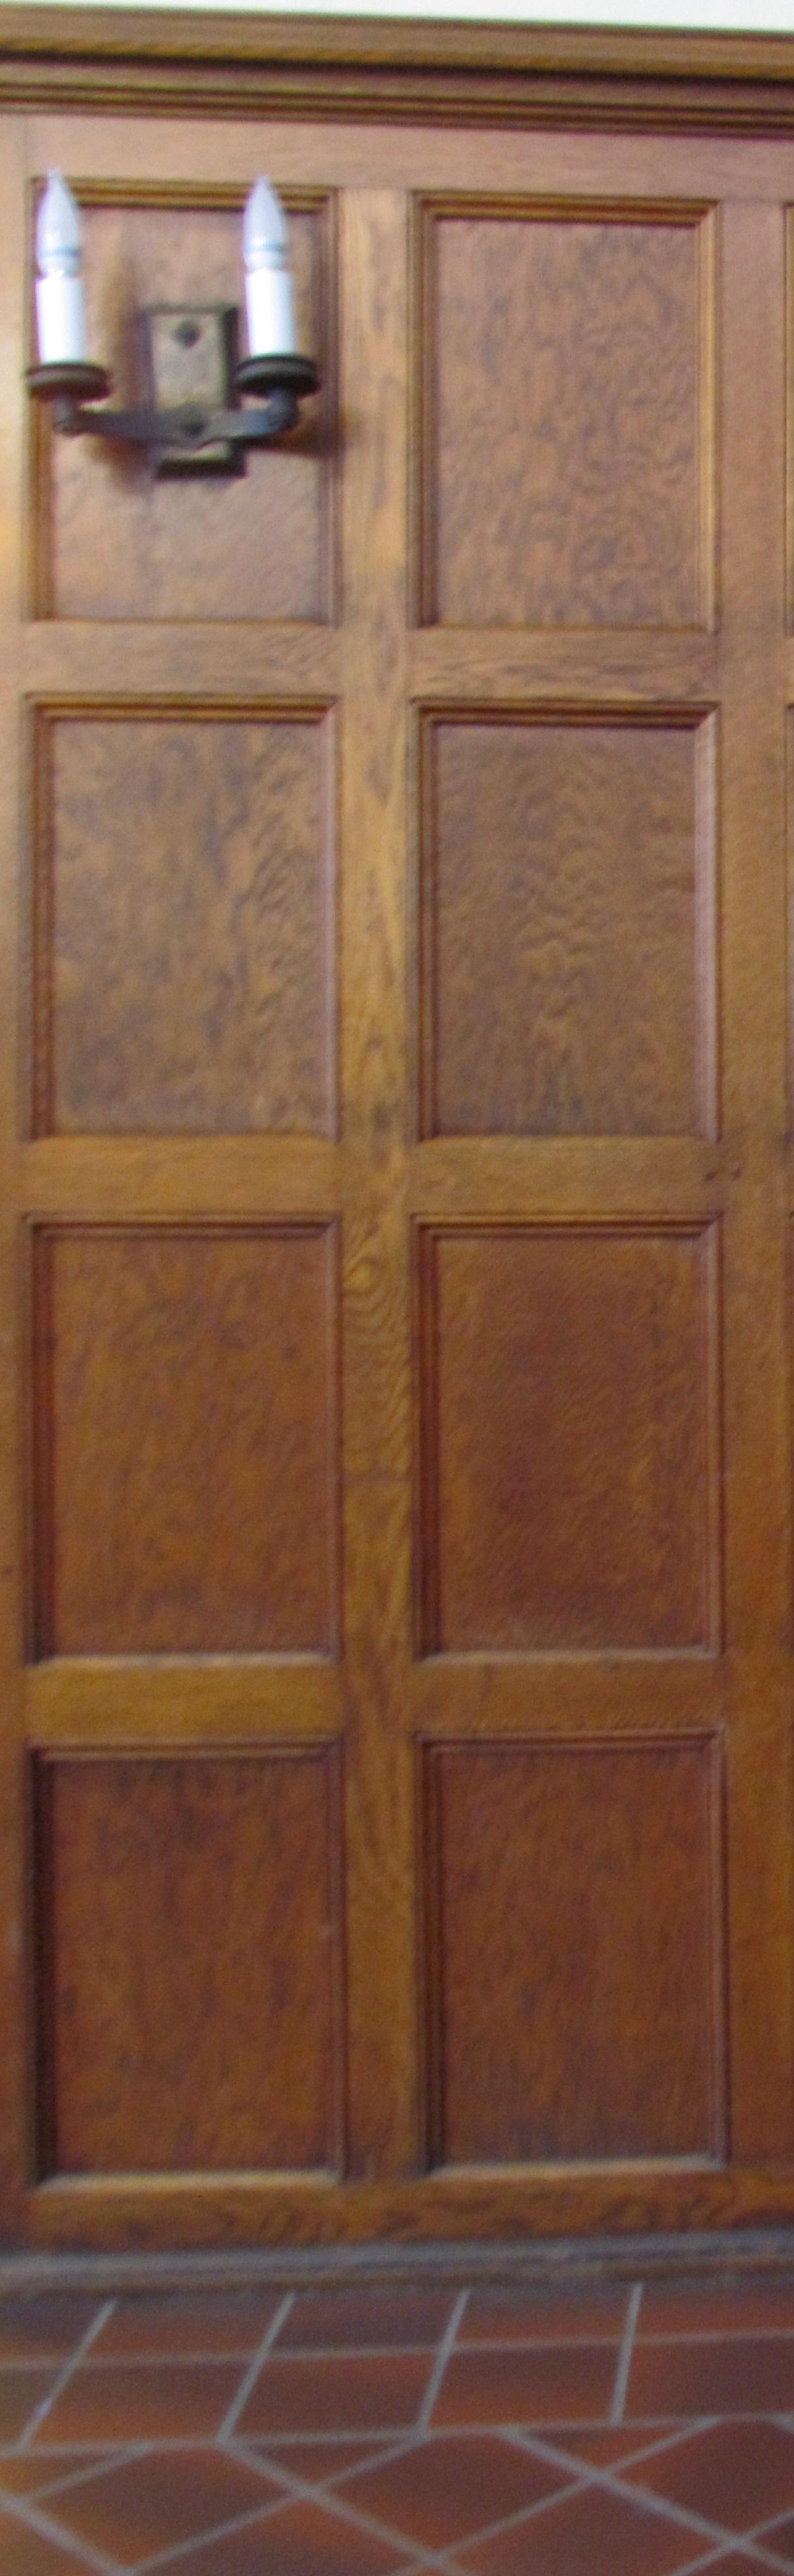 File Cushing House Wood Paneling Jpg Wikimedia Commons